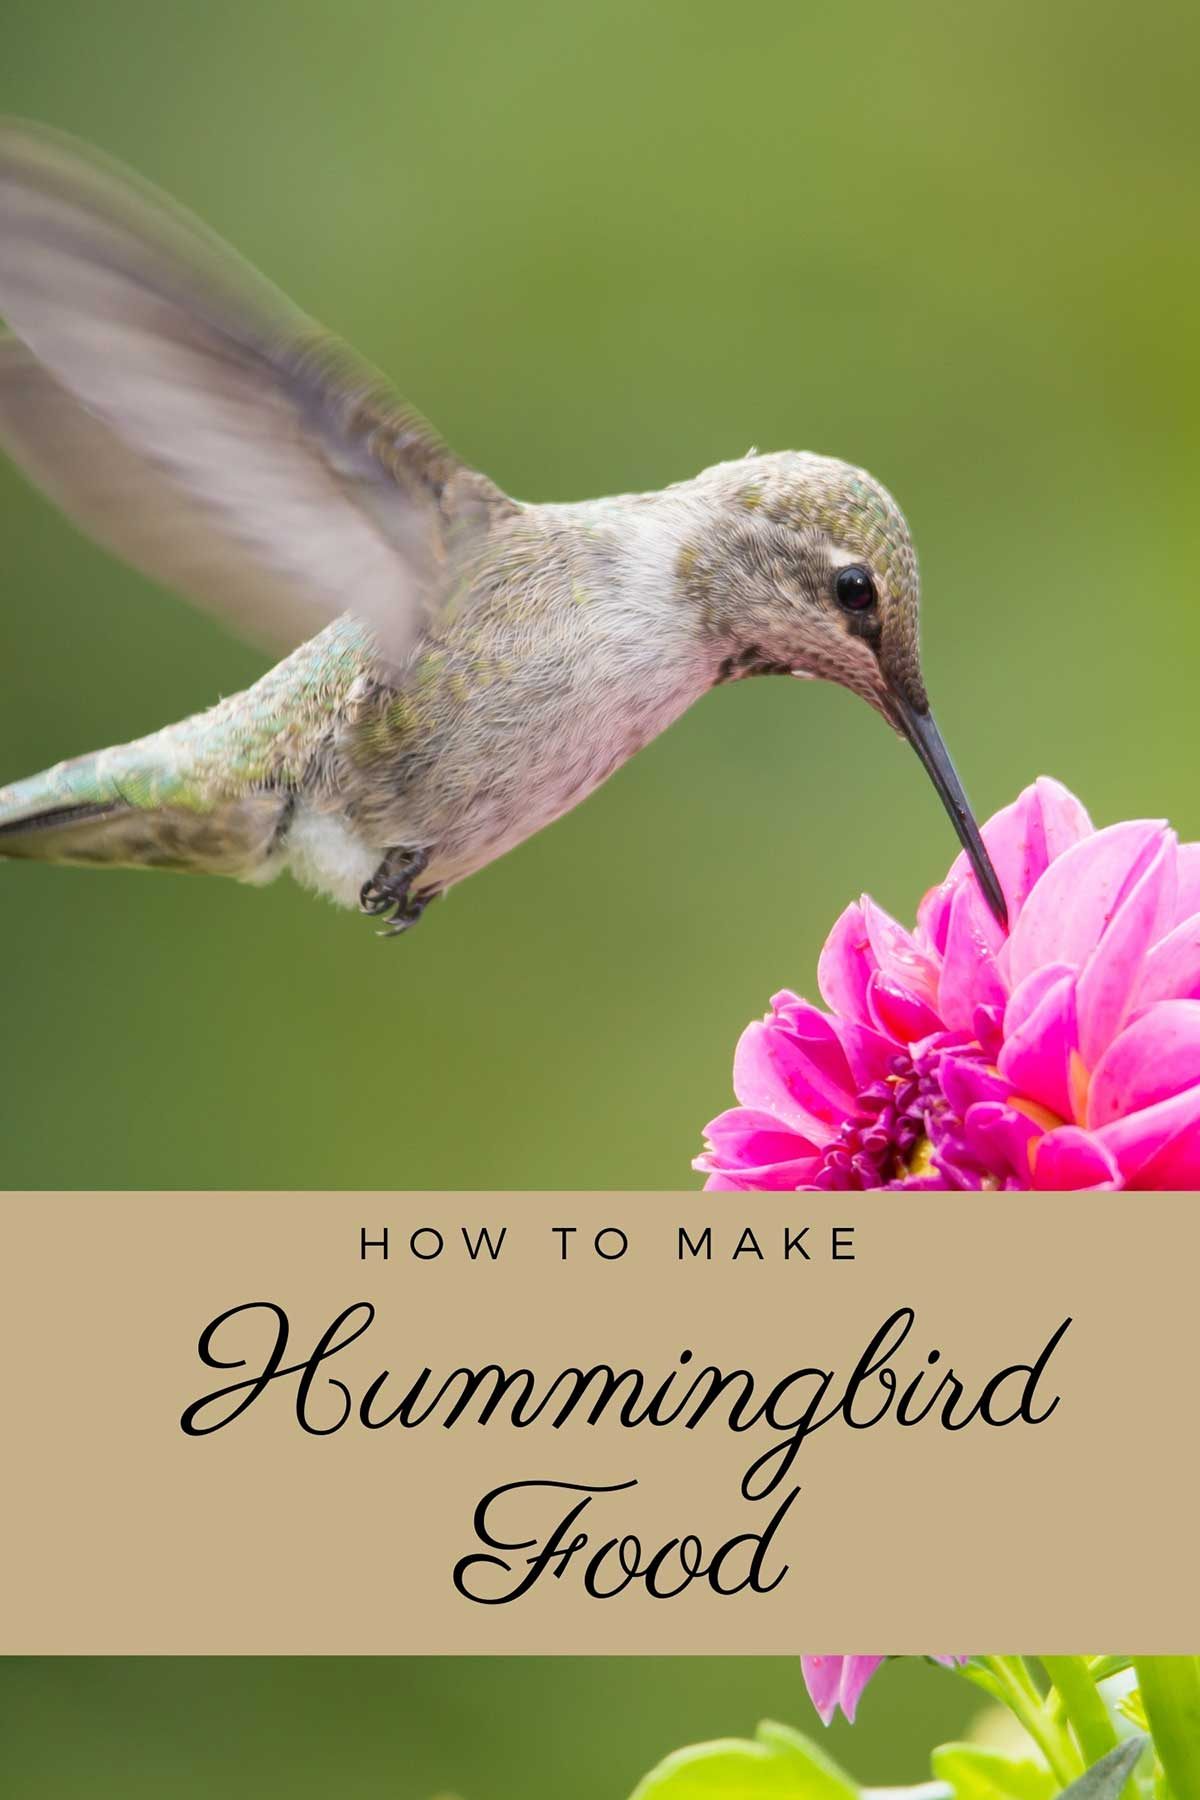 Hummingbird in flight feeding off flowers.